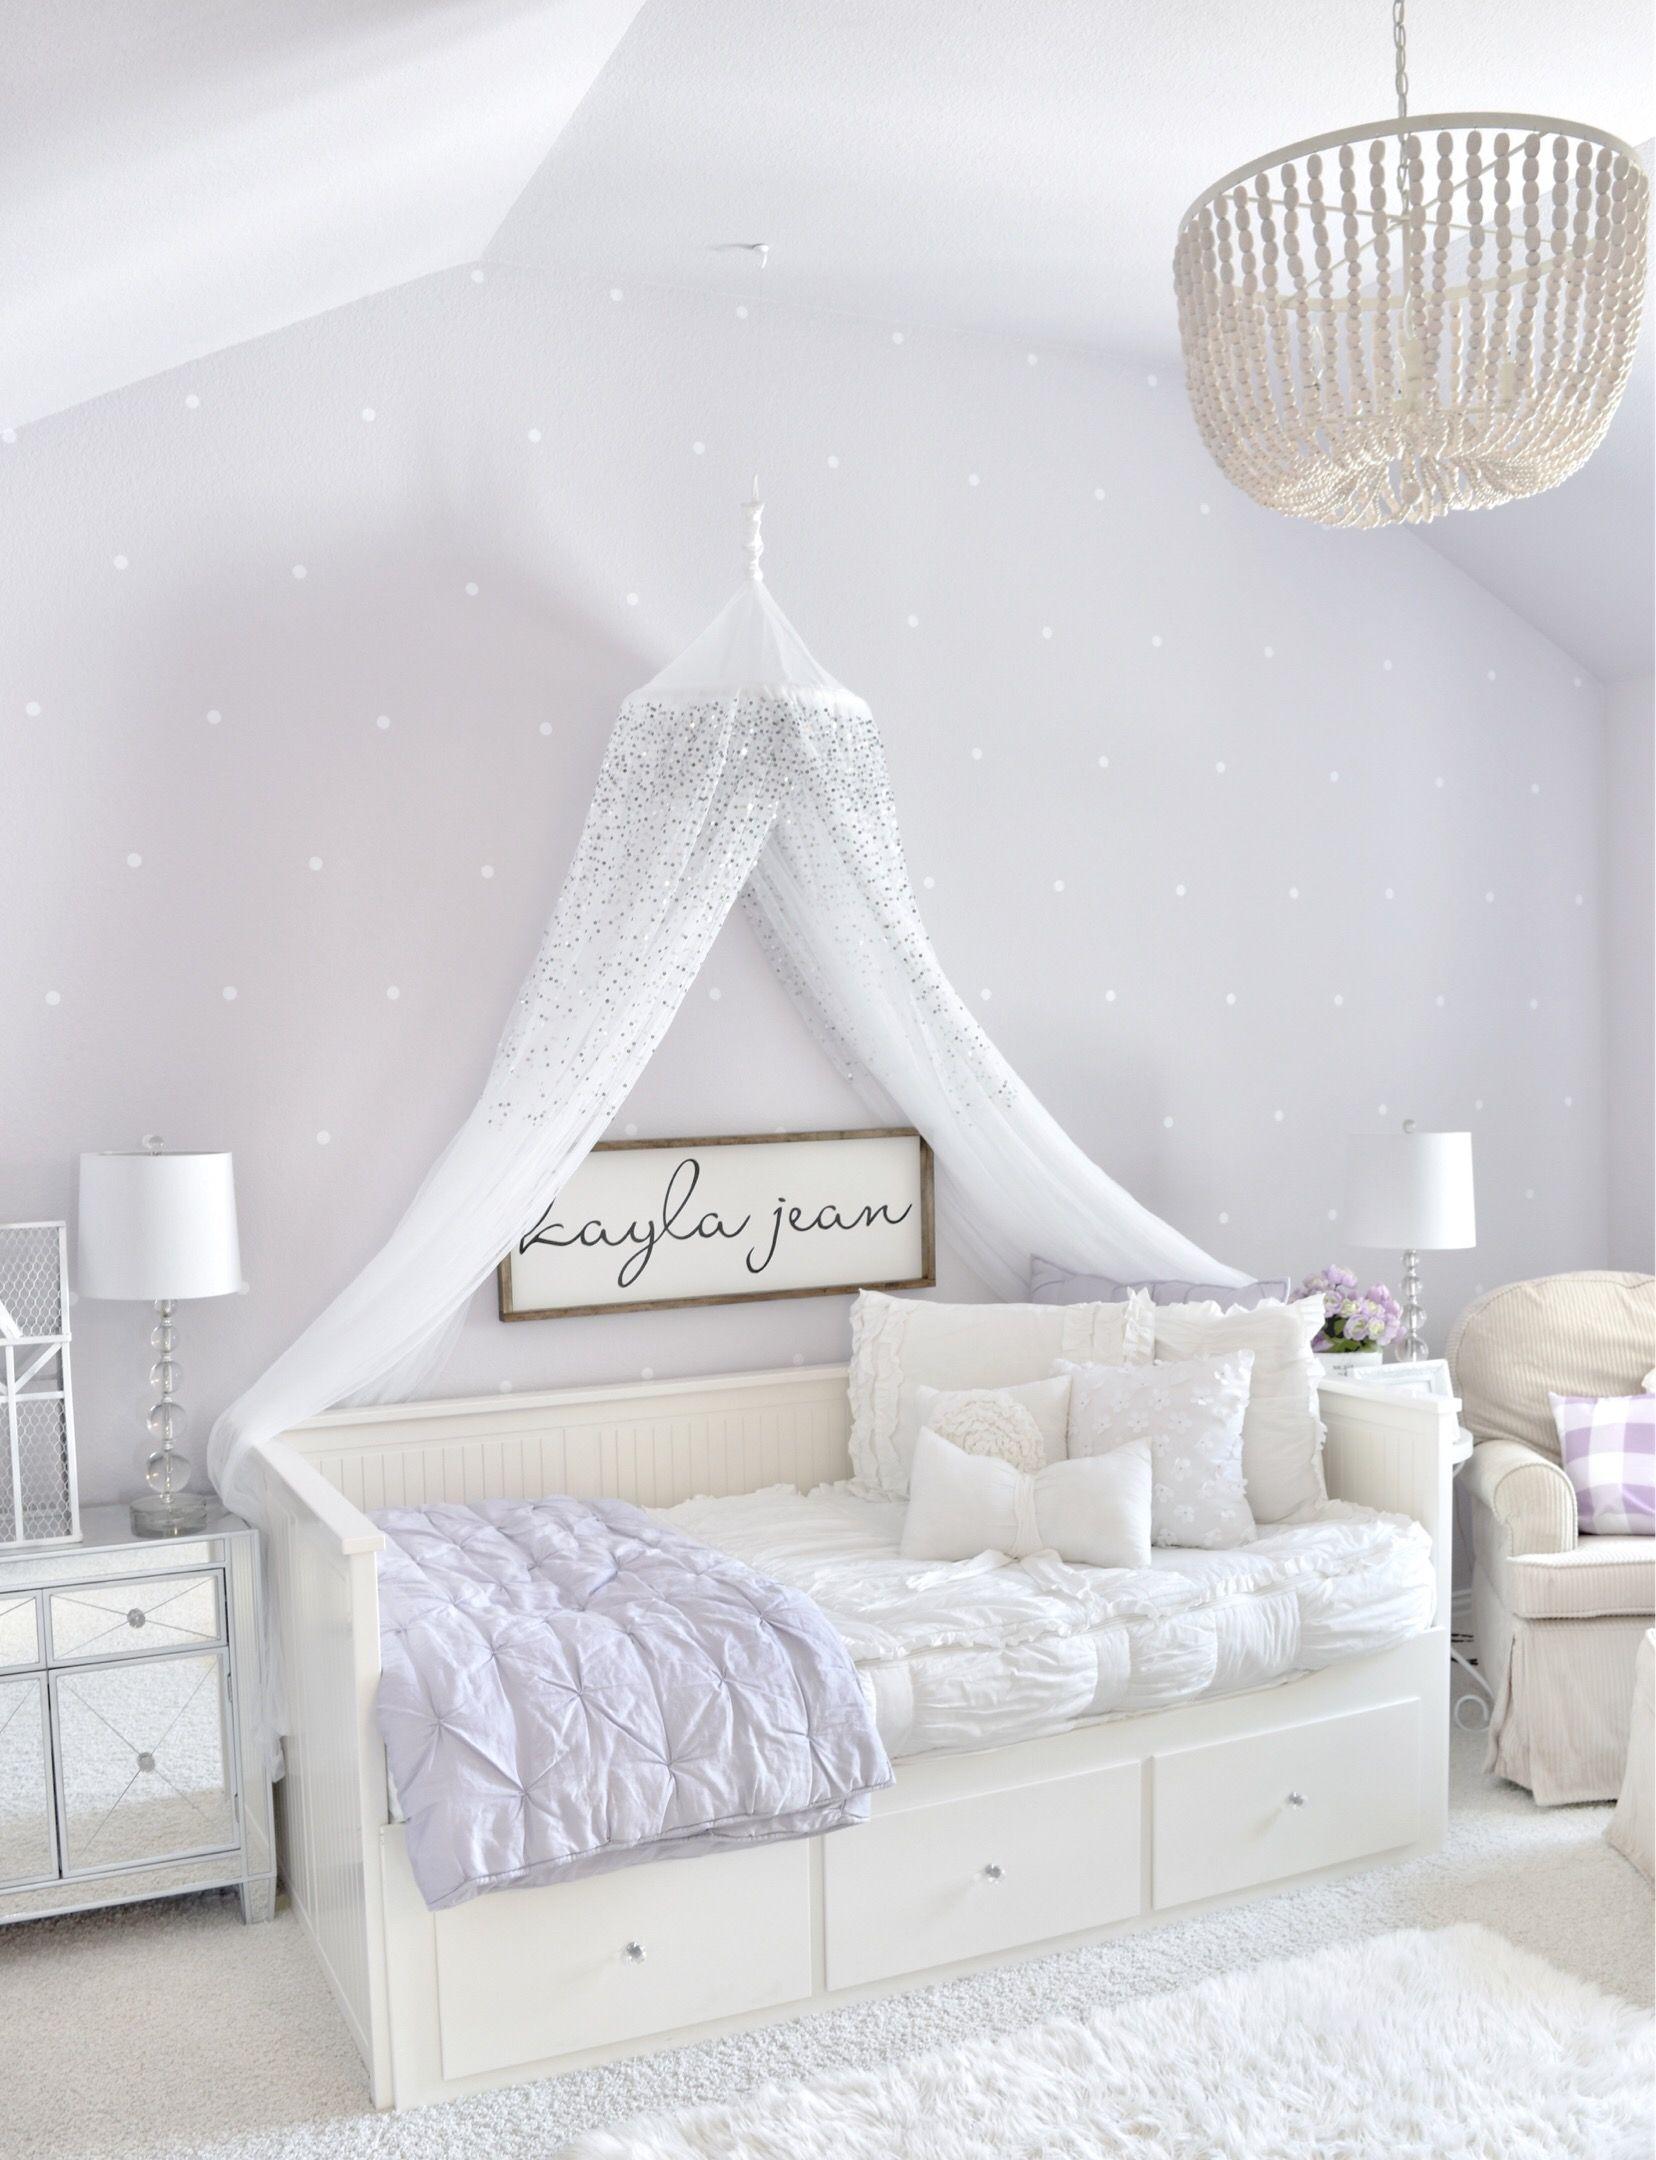 interior design ideas bedroom vintage. Vintage Kids Rooms - Children\u0027s Decor And Interior Design Ideas. Bedroom For Girls KidsChilds BedroomKids PaintGirls Room Ideas